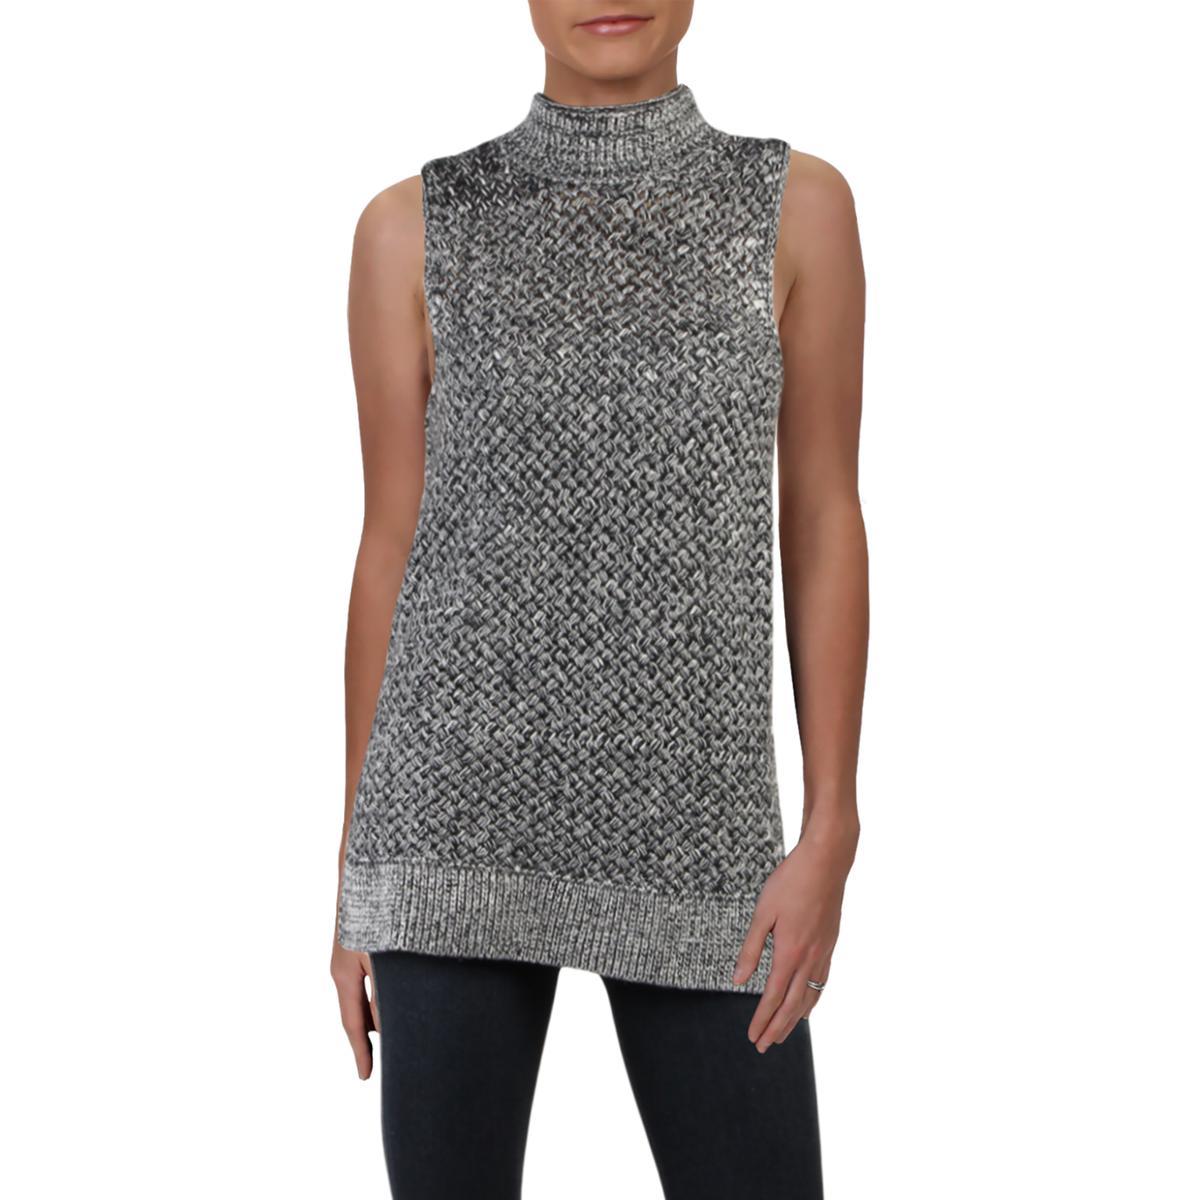 Sanctuary Womens Gretchen Black Wool Fashion Pullover Sweater Top XL BHFO 9891